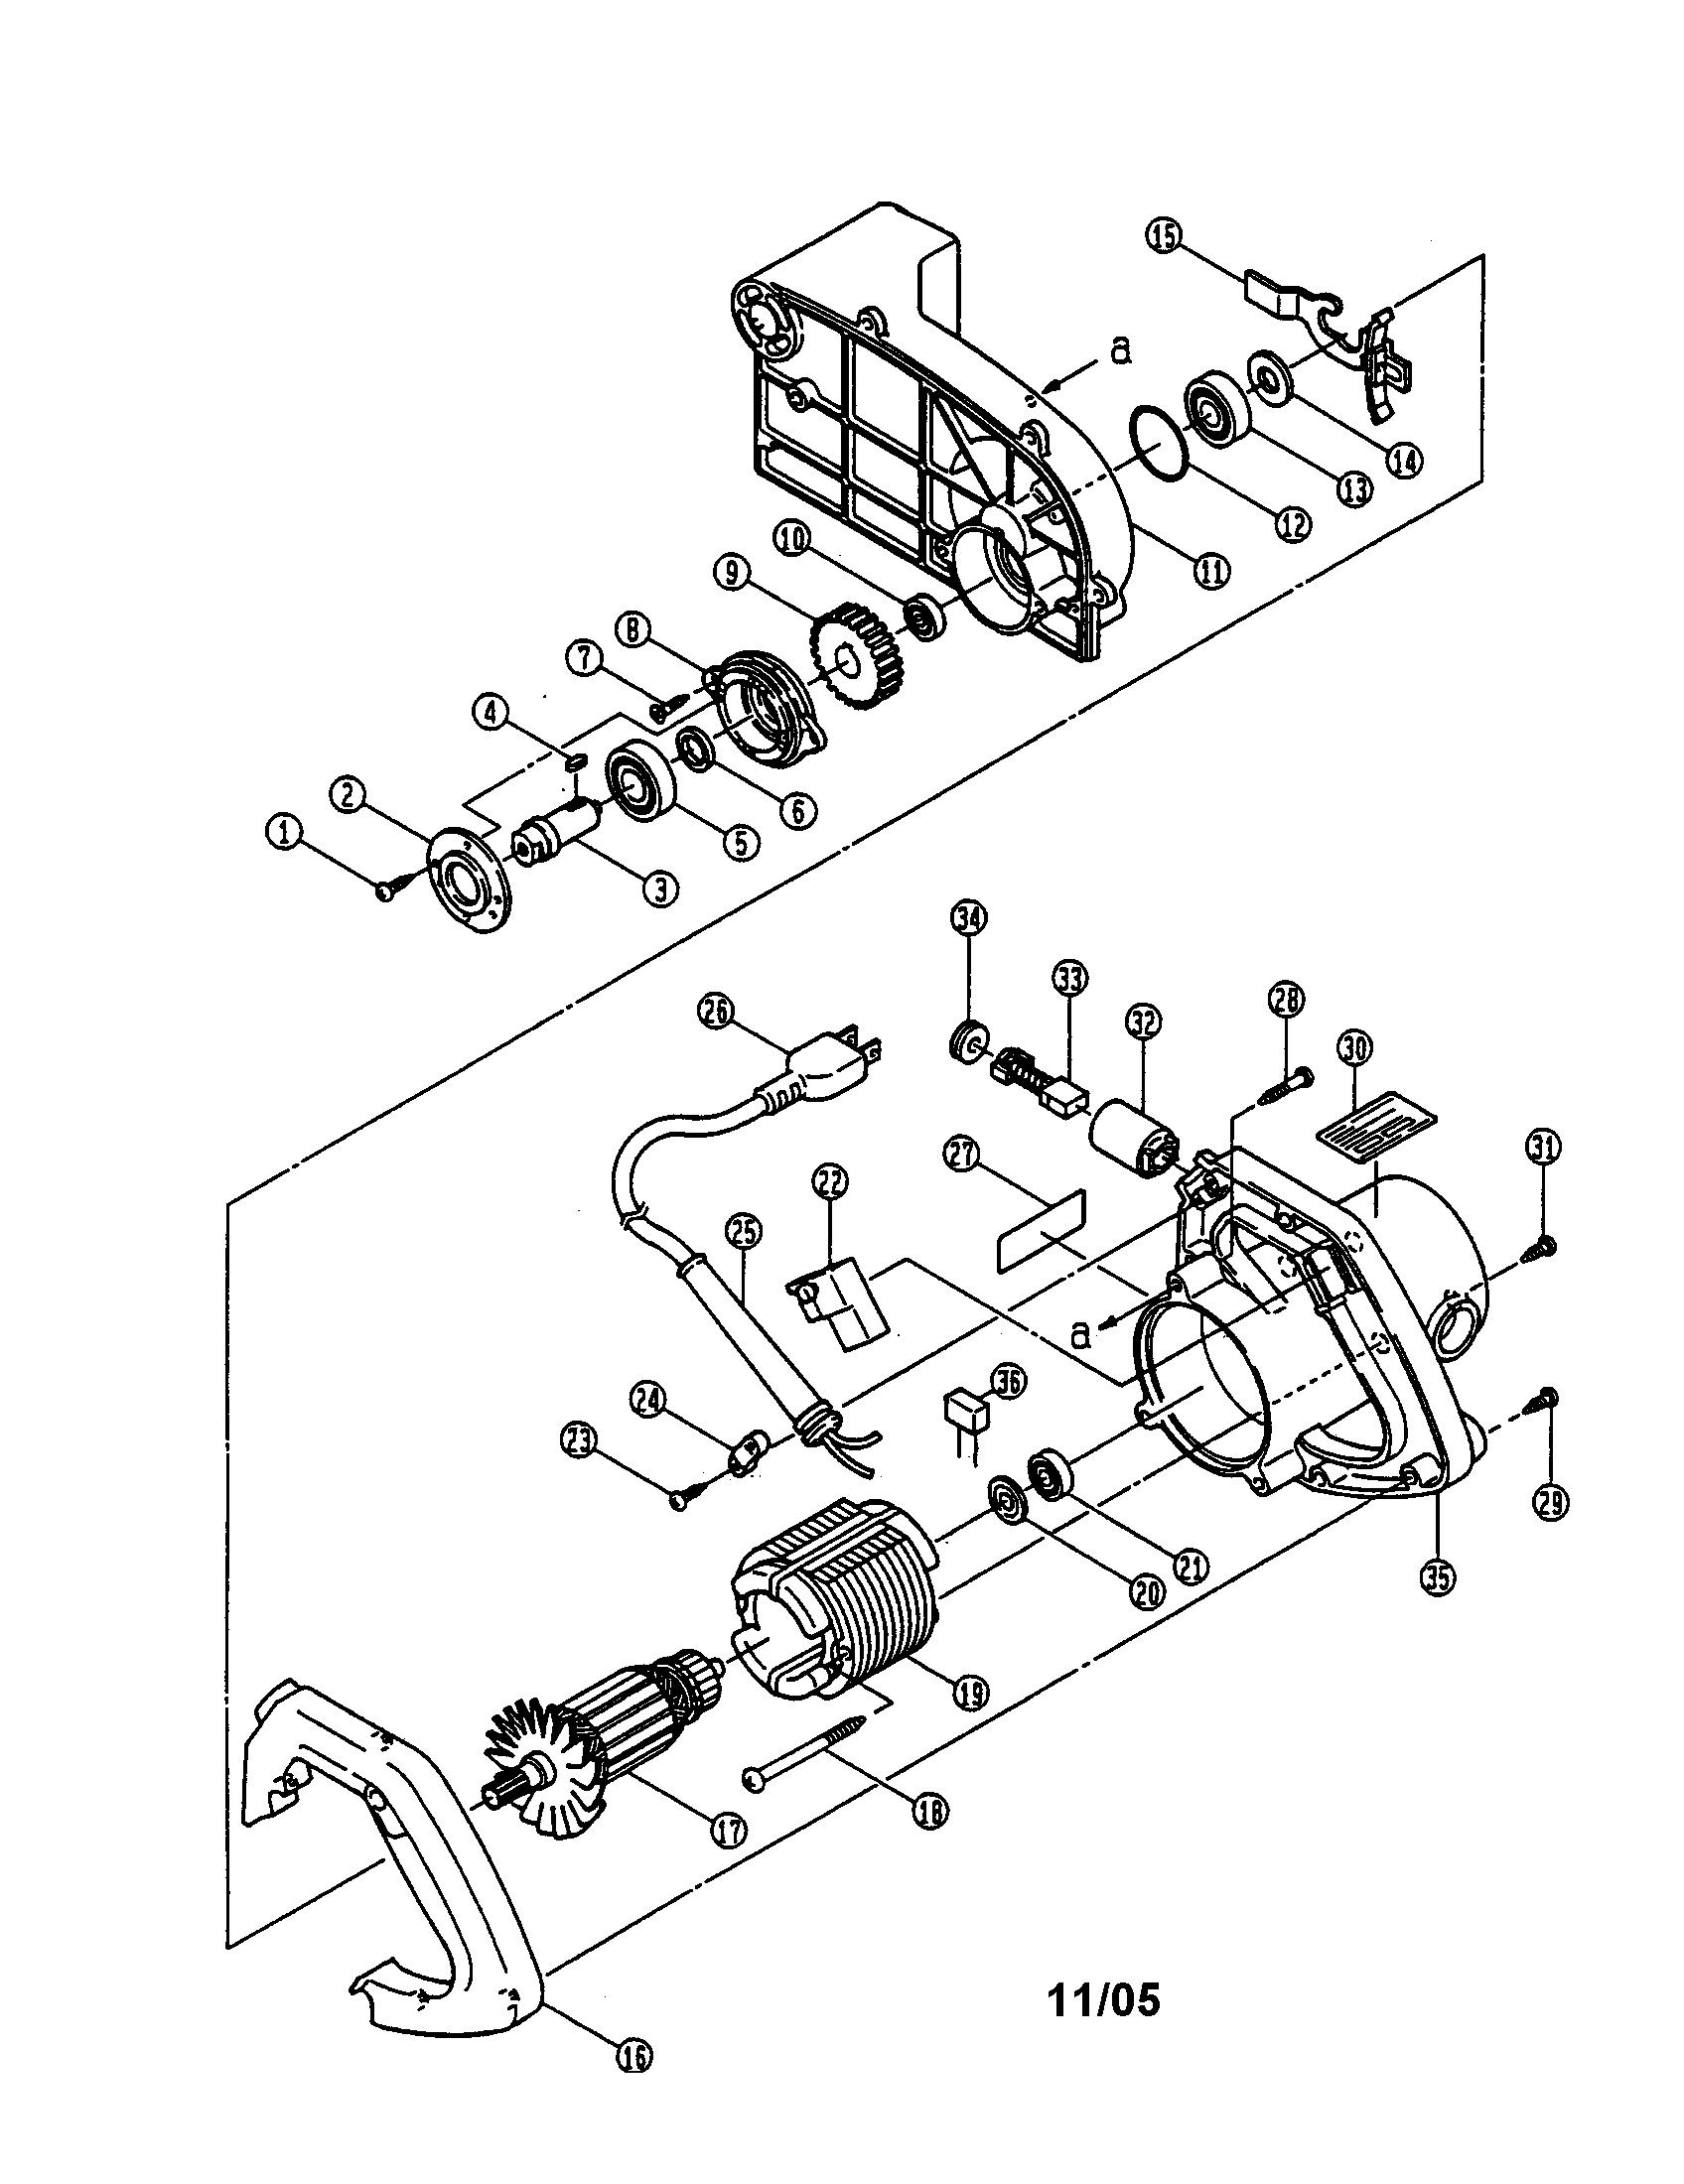 Ryobi model TSS-220 miter saw genuine parts